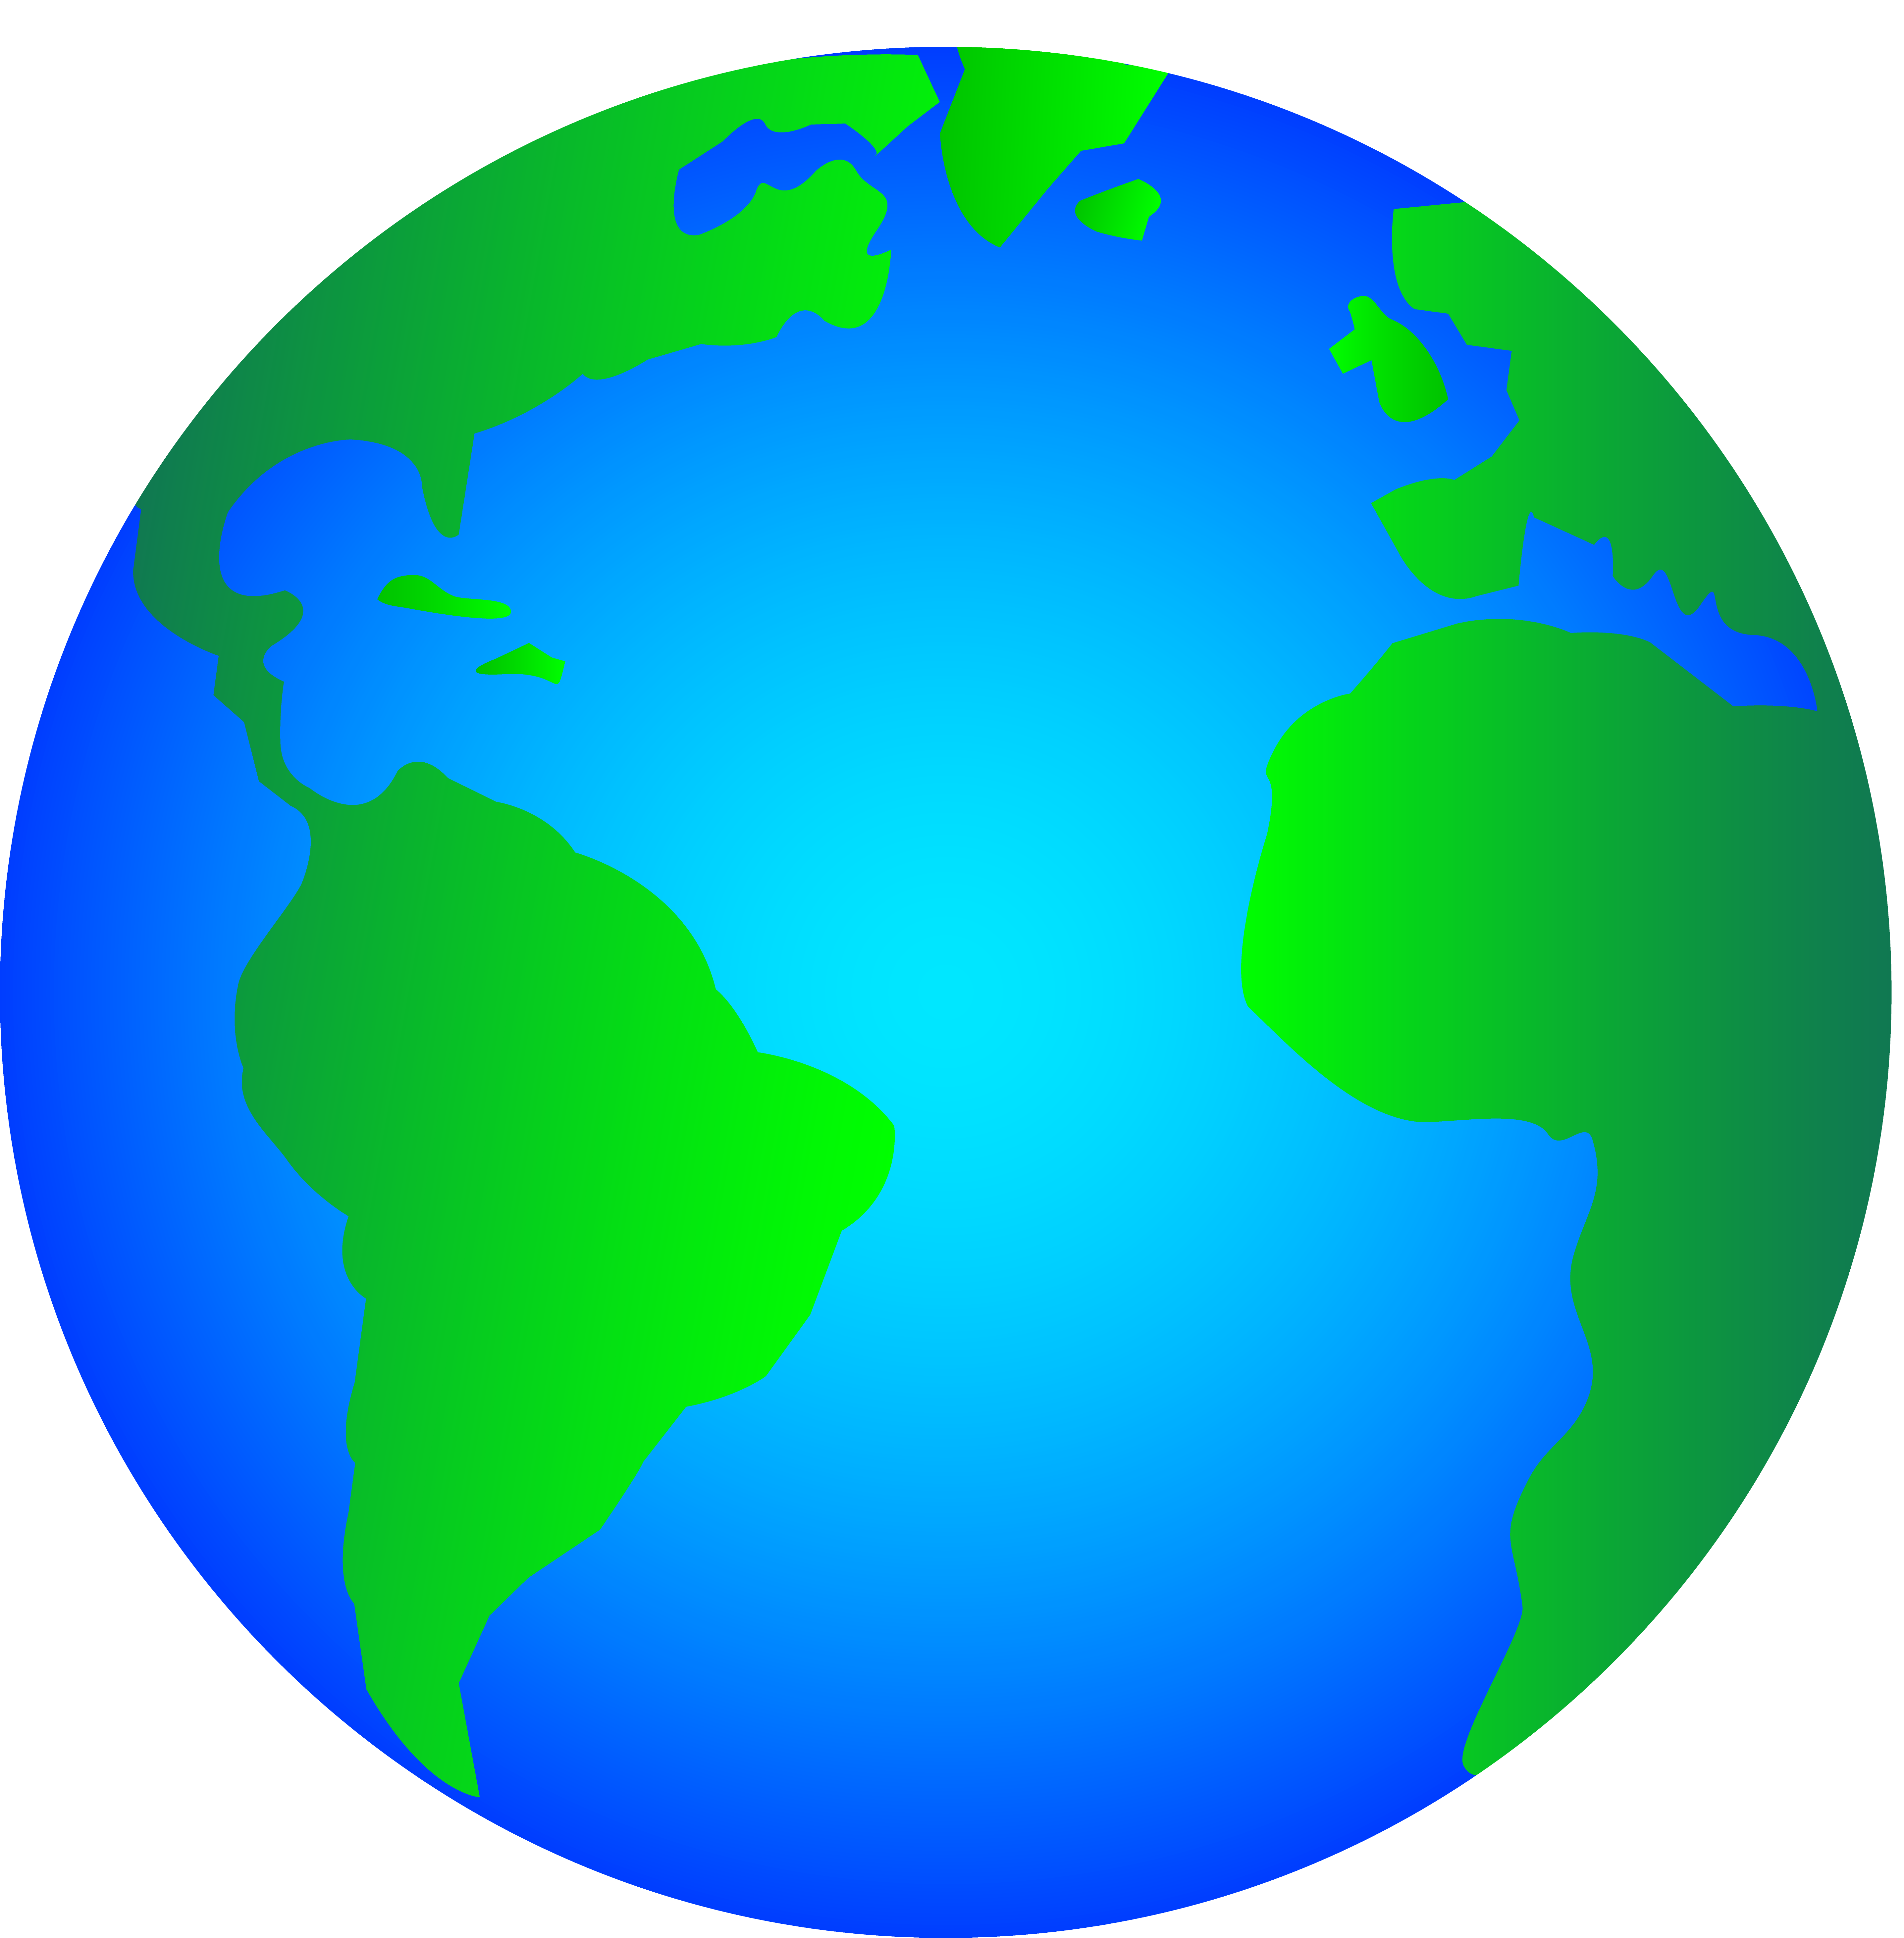 Apple globe world map clipart banner royalty free img.clipartall.com animated-globe-clip-art-globe-clipart-free ... banner royalty free